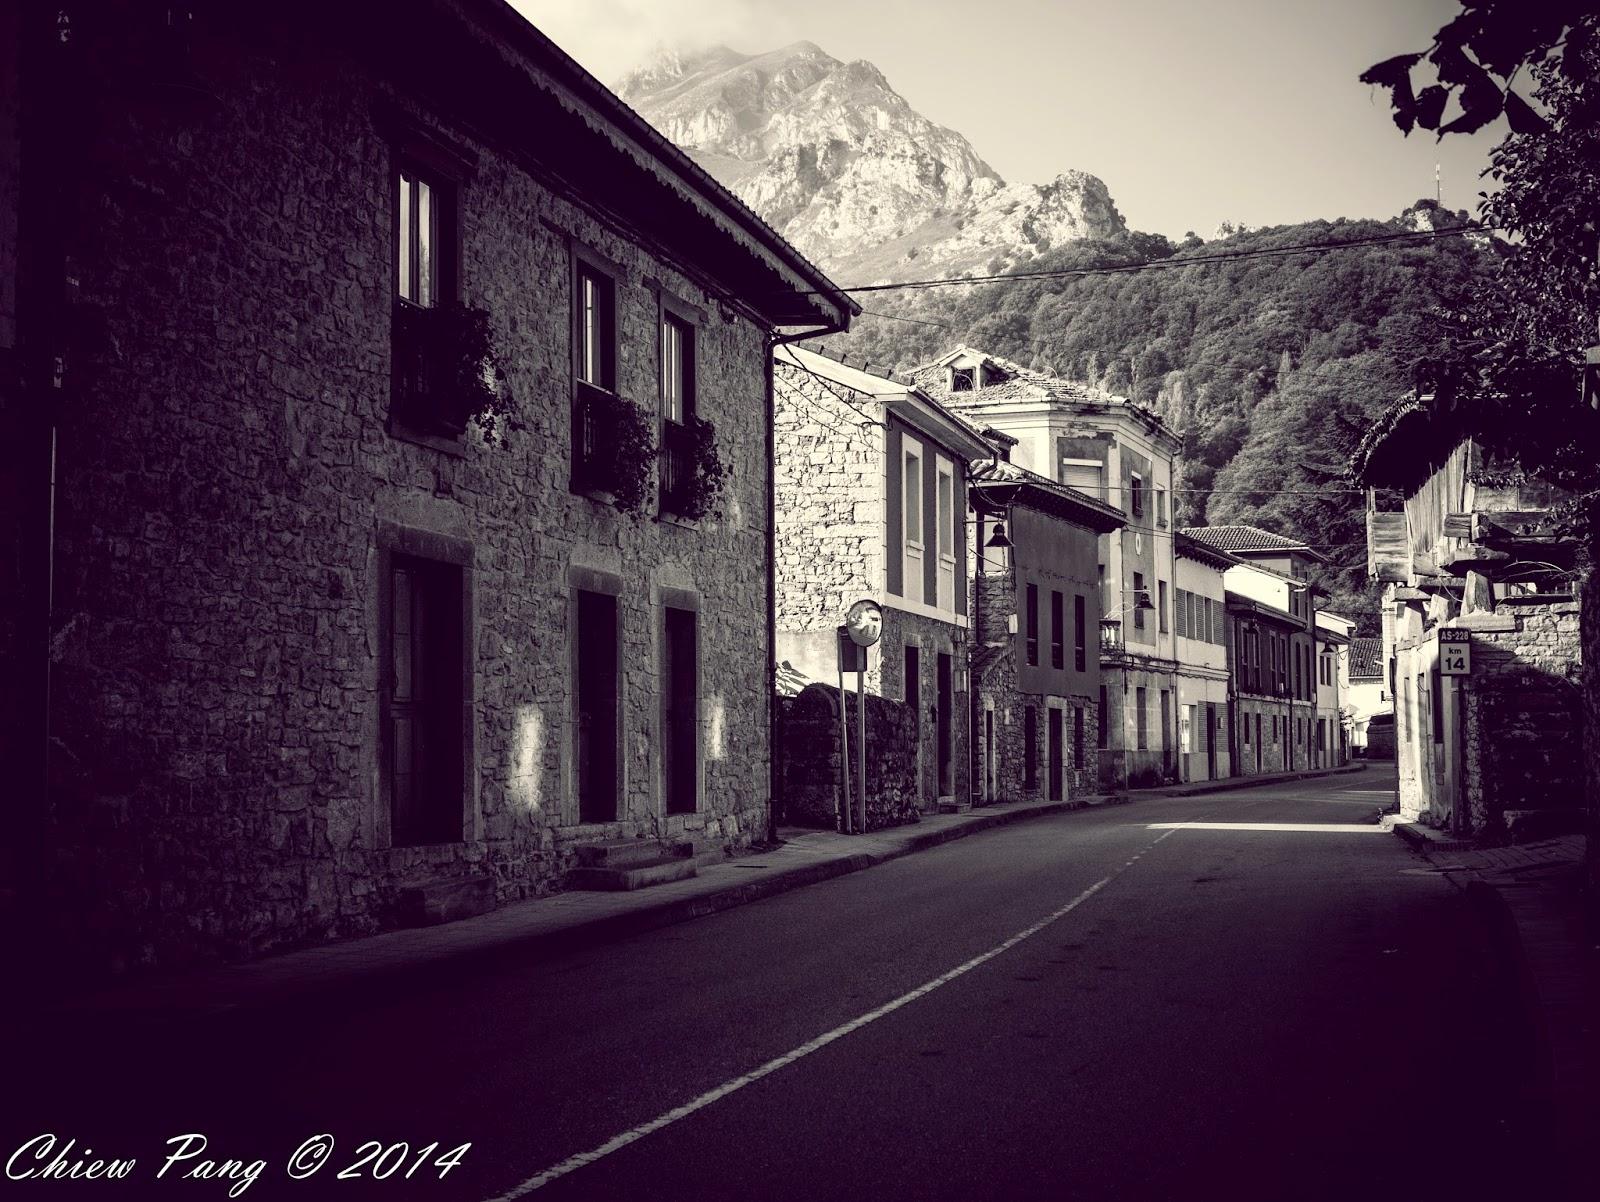 Proaza, Asturias